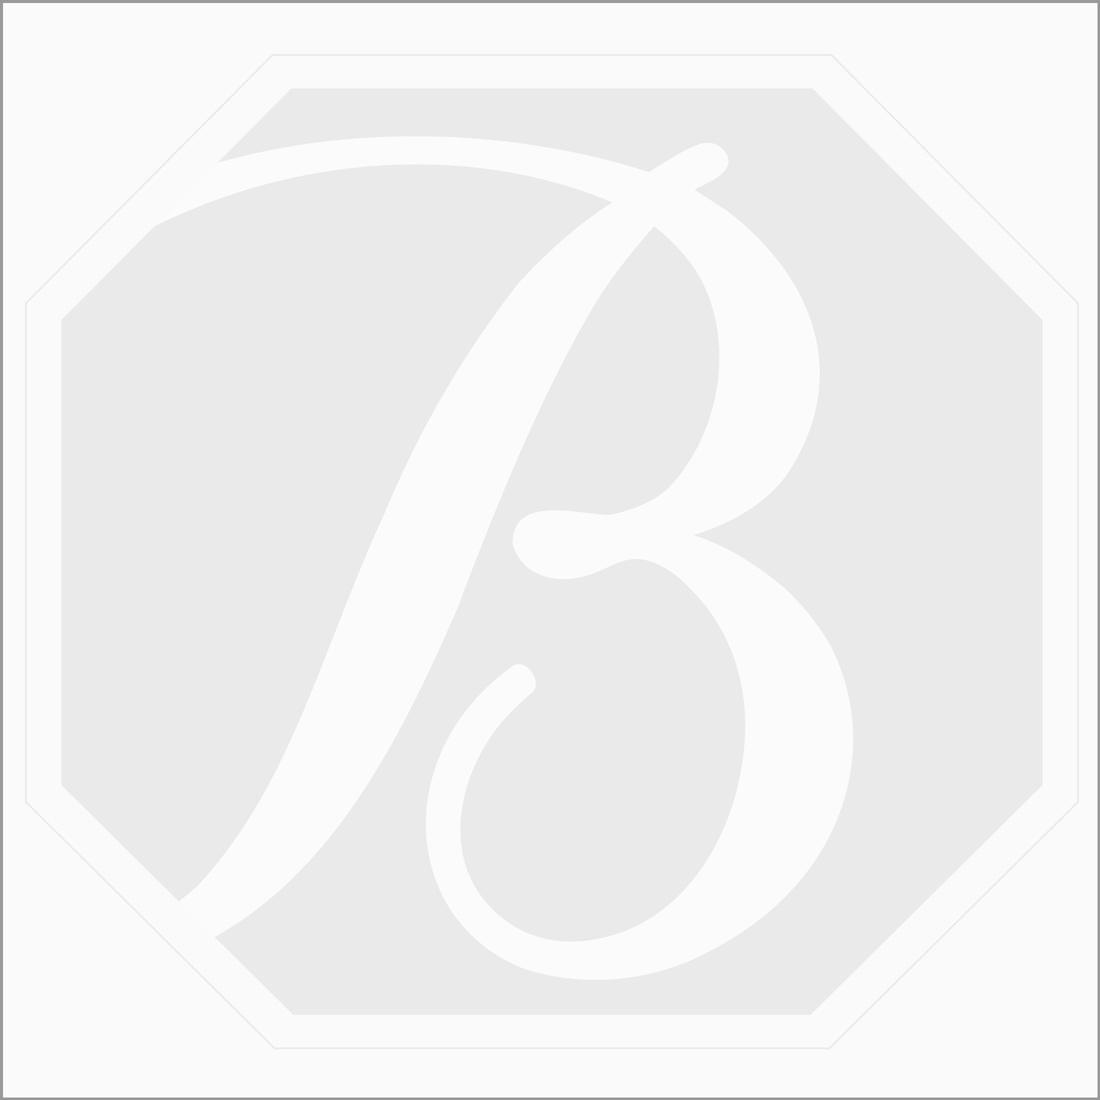 Tourmaline Briolette - 1 Line - 258.00 carats - 14 inches - (CSNKL1026)